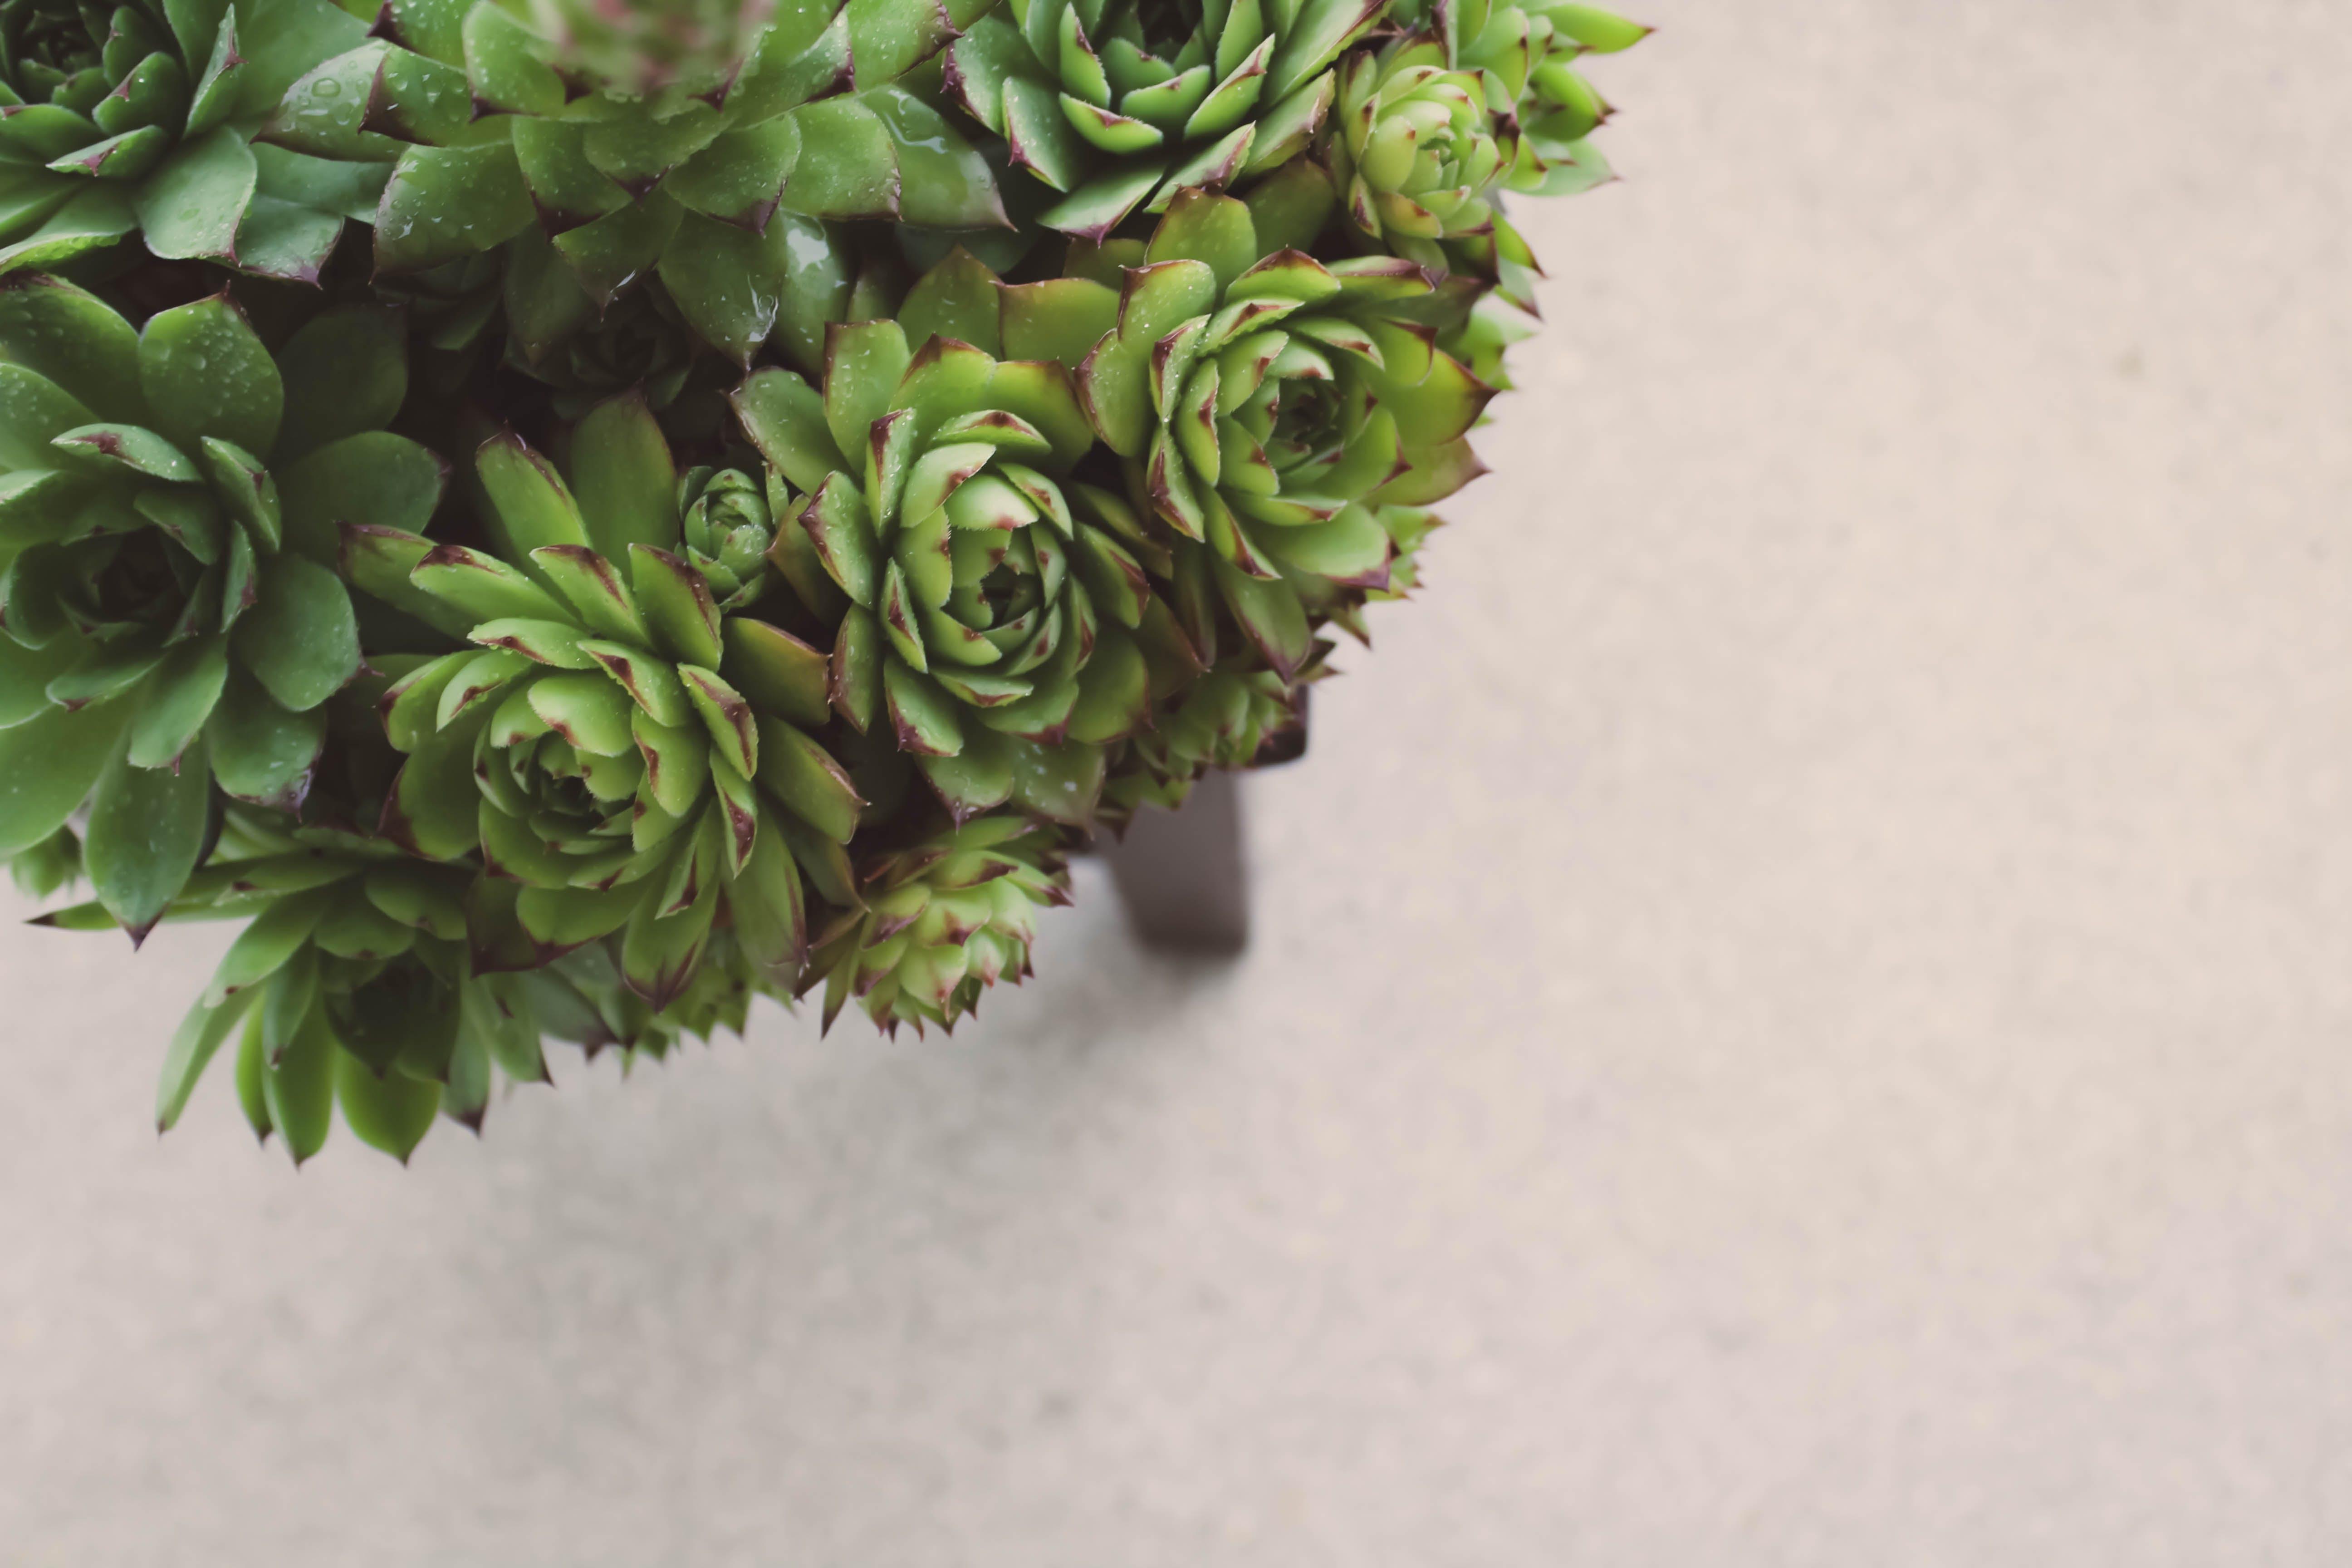 Kostenloses Stock Foto zu dunkelgrün, dunkelgrüne pflanzen, garten, gartenarbeit